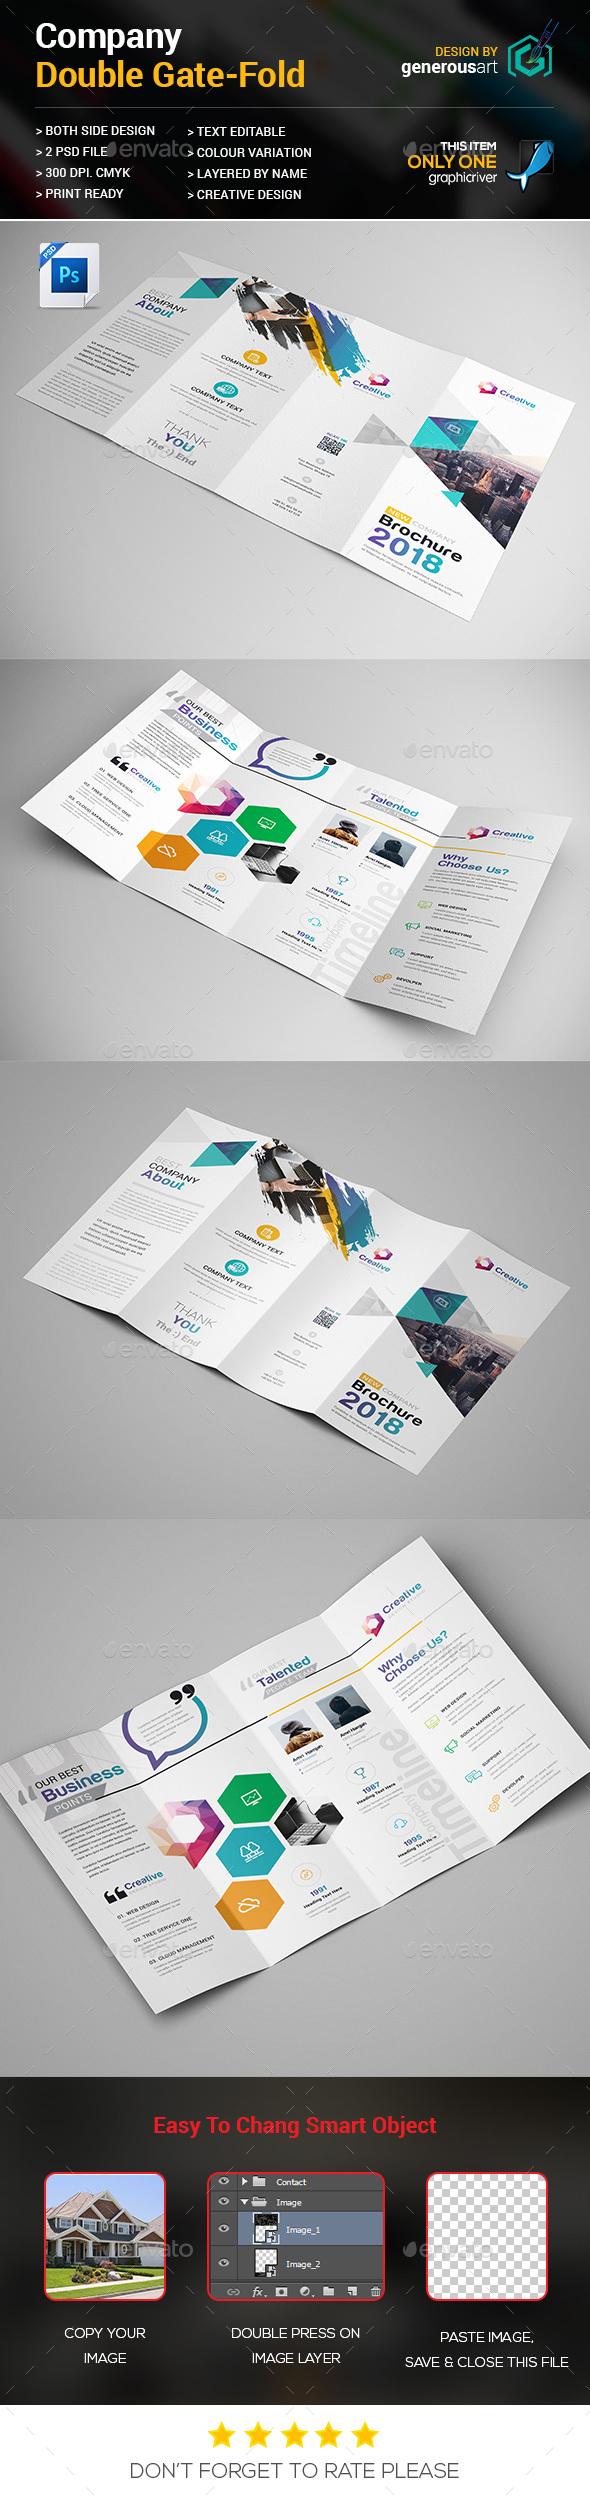 Double Gate-fold - Corporate Brochures